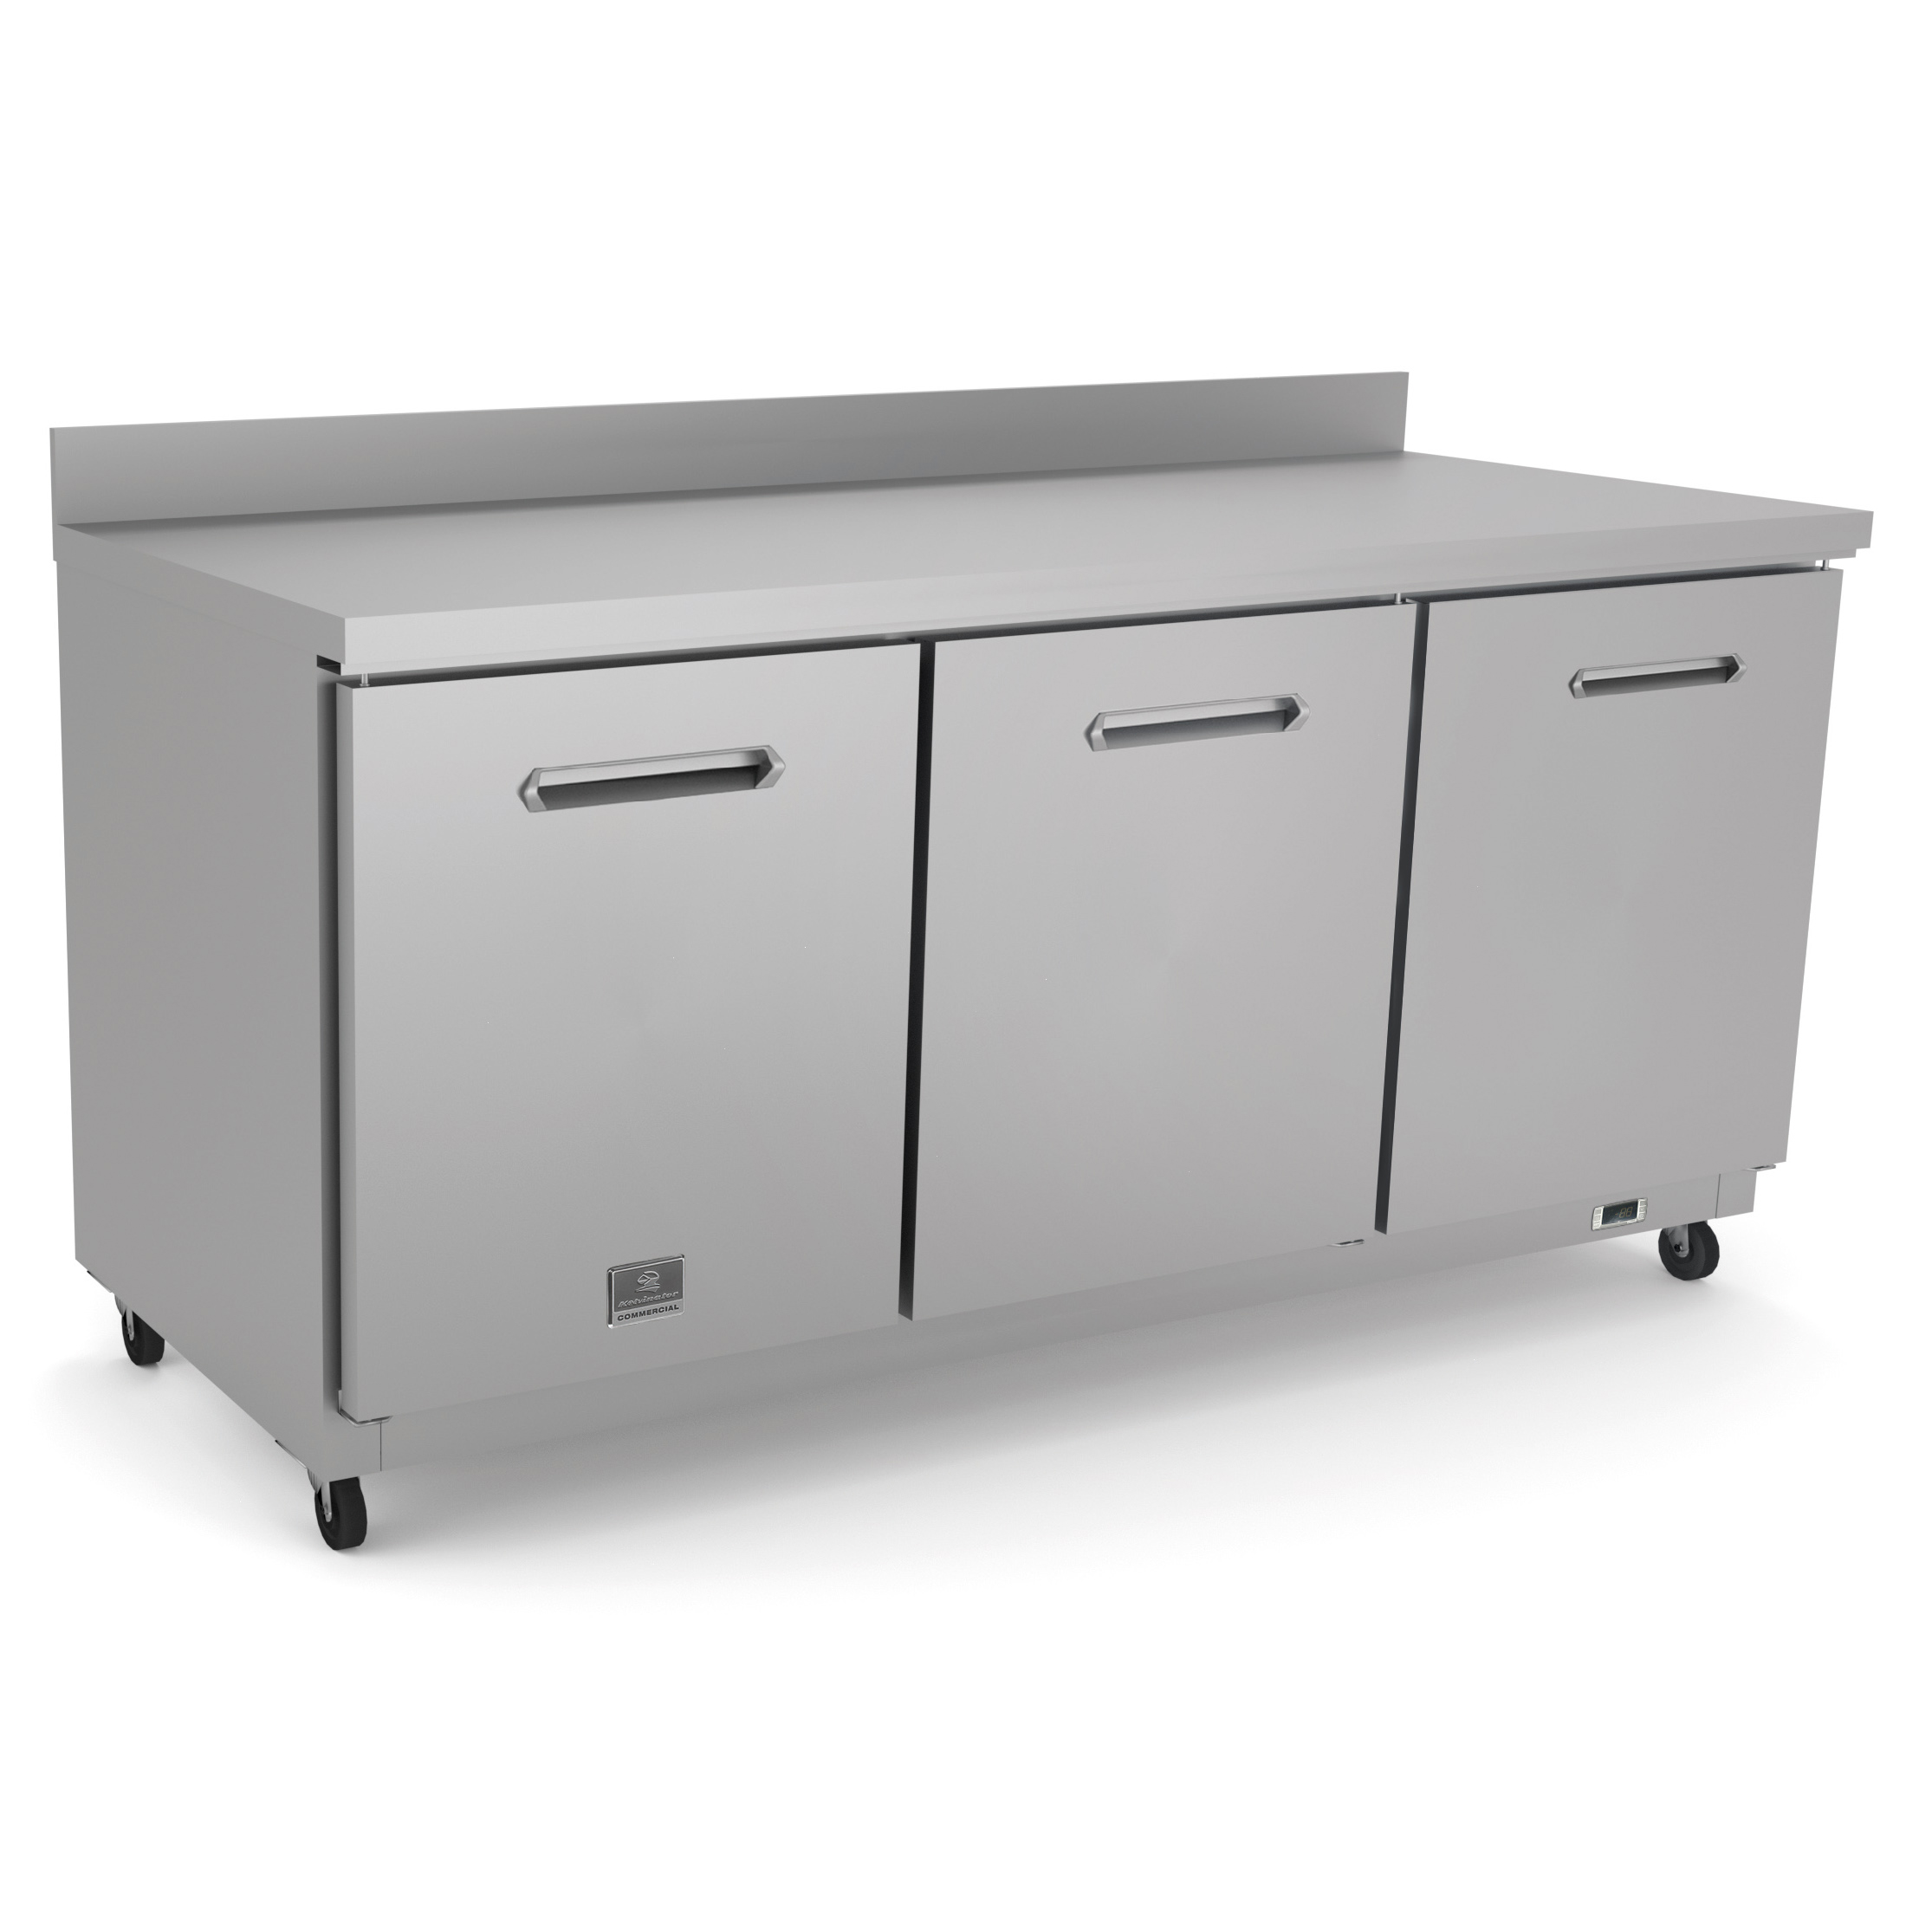 Kelvinator Commercial KCHUCWT72R refrigerator, undercounter, reach-in